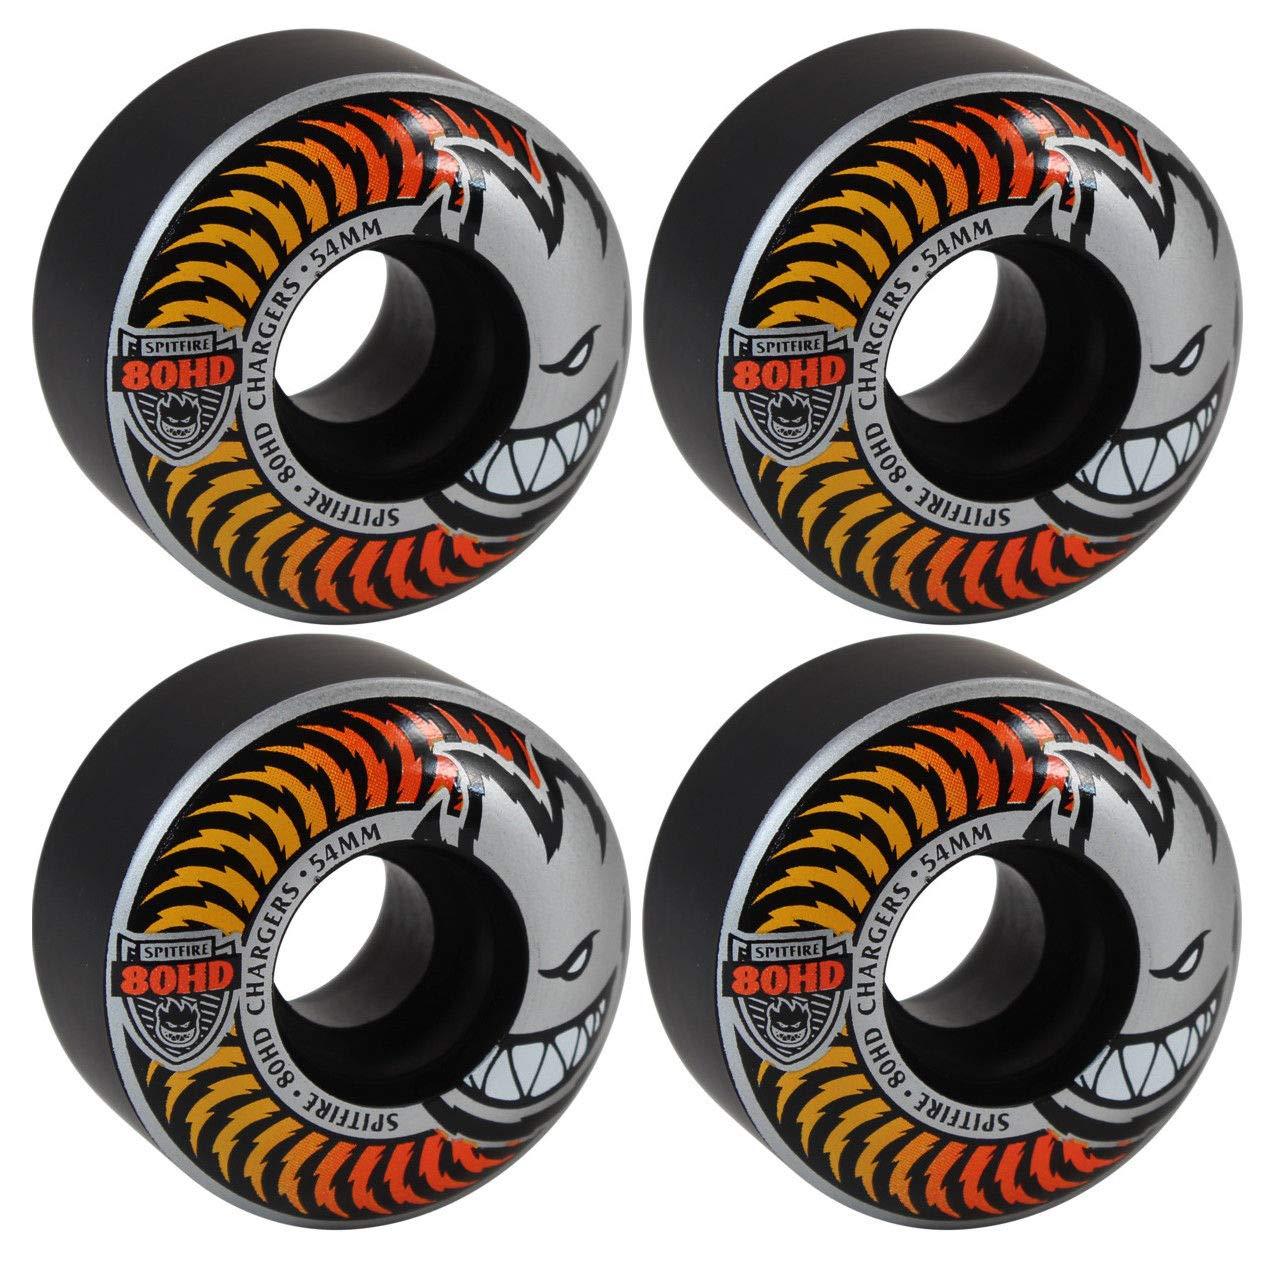 54Mm 80Hd Charger Classic Black Orange/Yellow Fade Skateboard Wheels